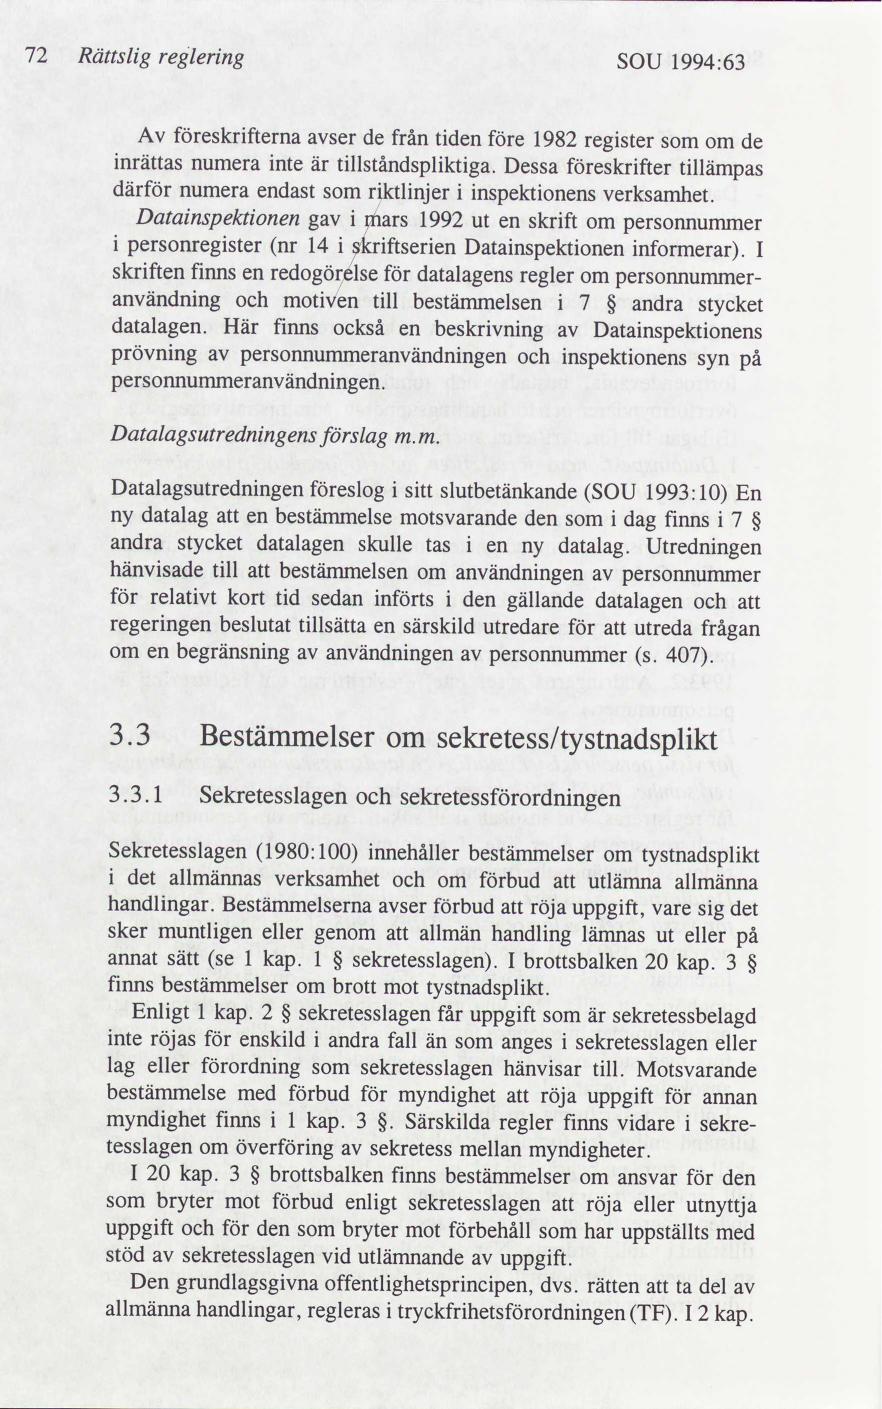 Wennman tyskland england 7 1 i poang